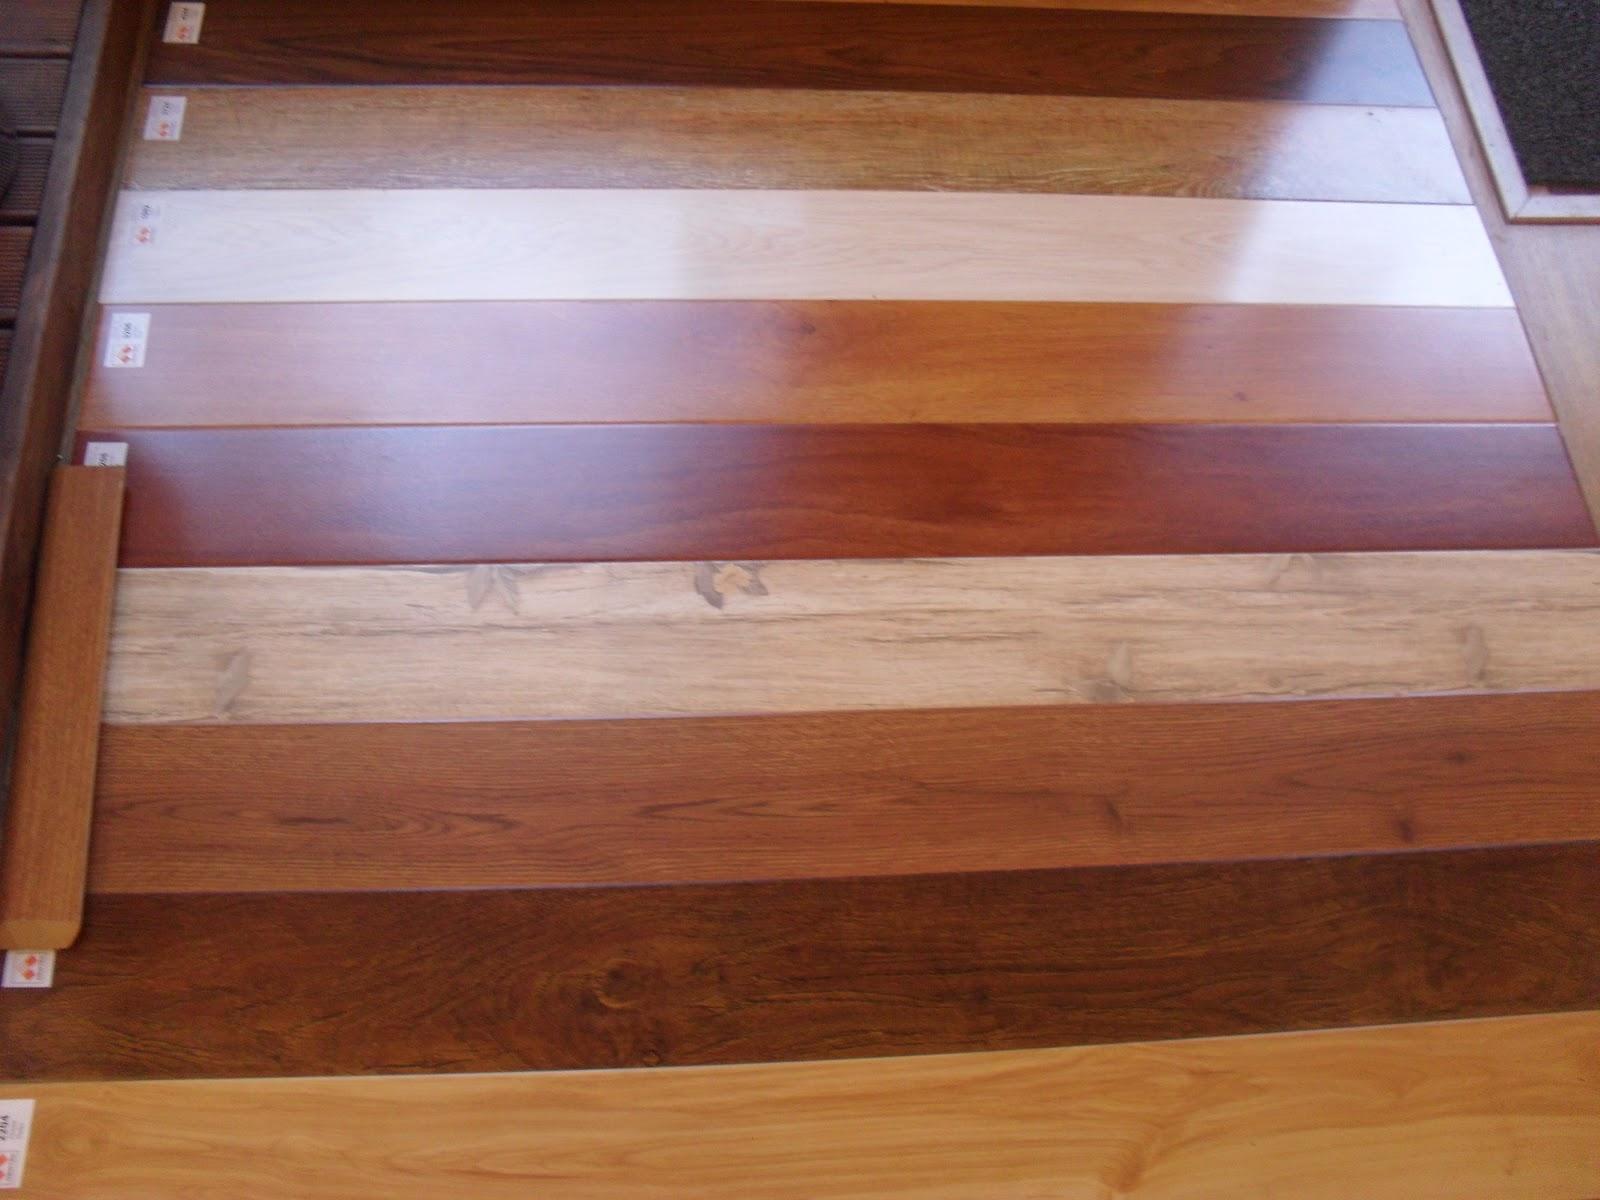 Como instalar pisos de madera for Bar flotante de madera